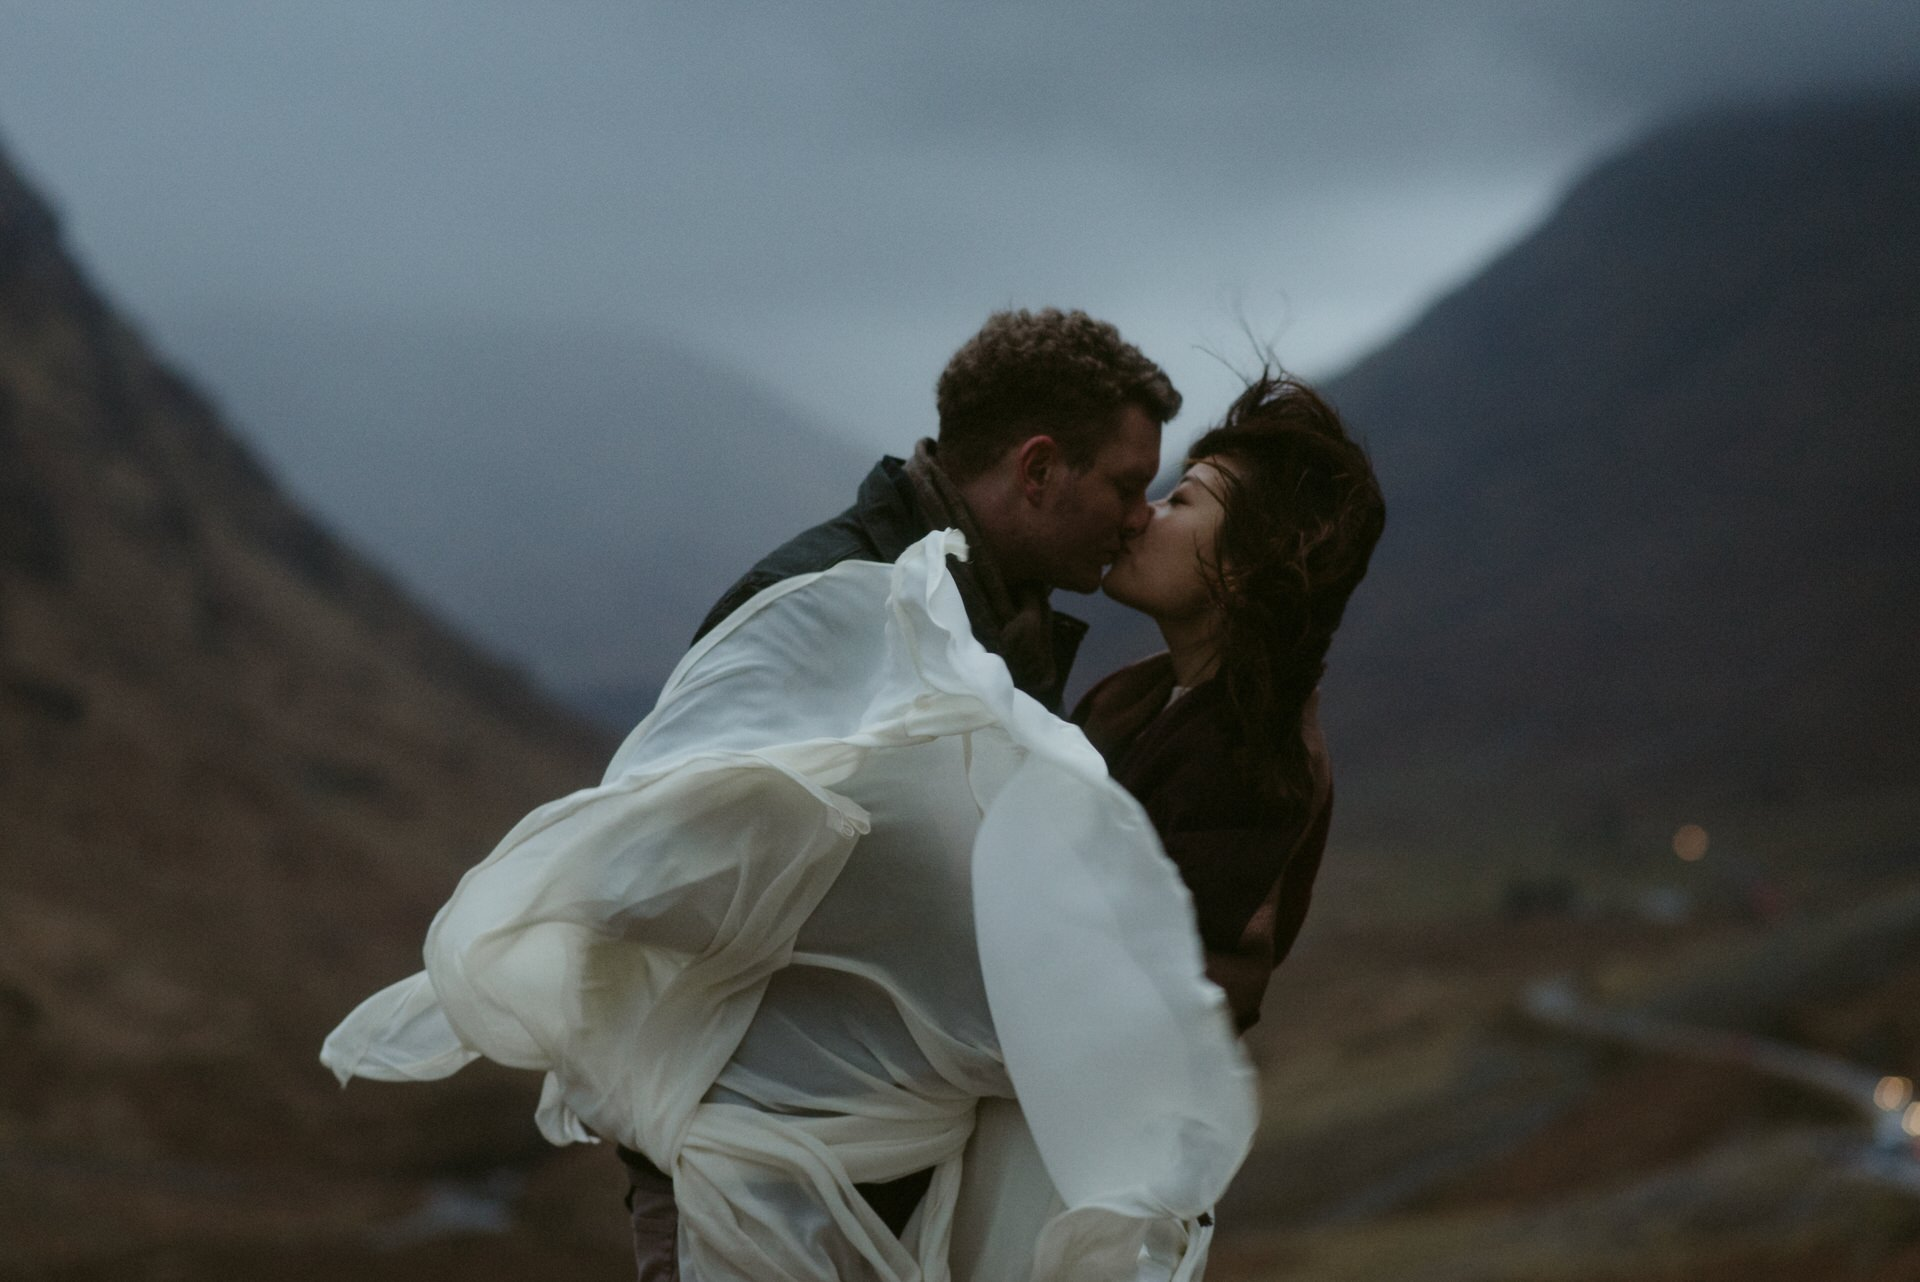 Surprise-Marriage-Proposal-Glencoe_94